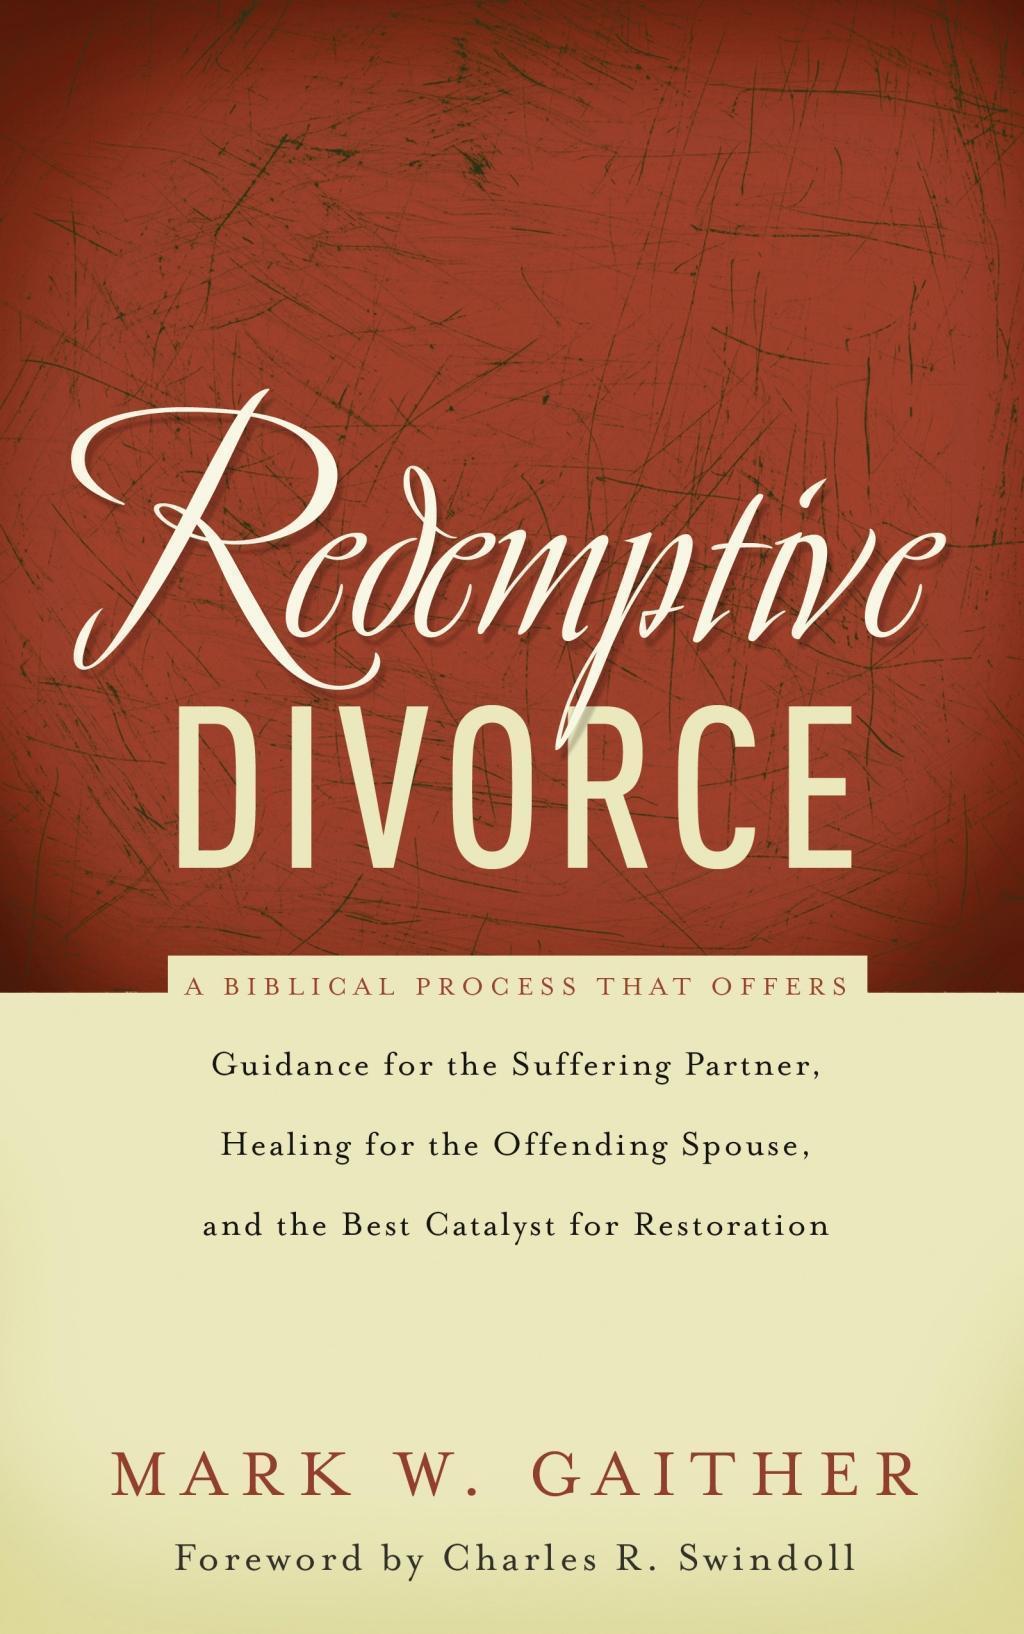 Redemptive Divorce